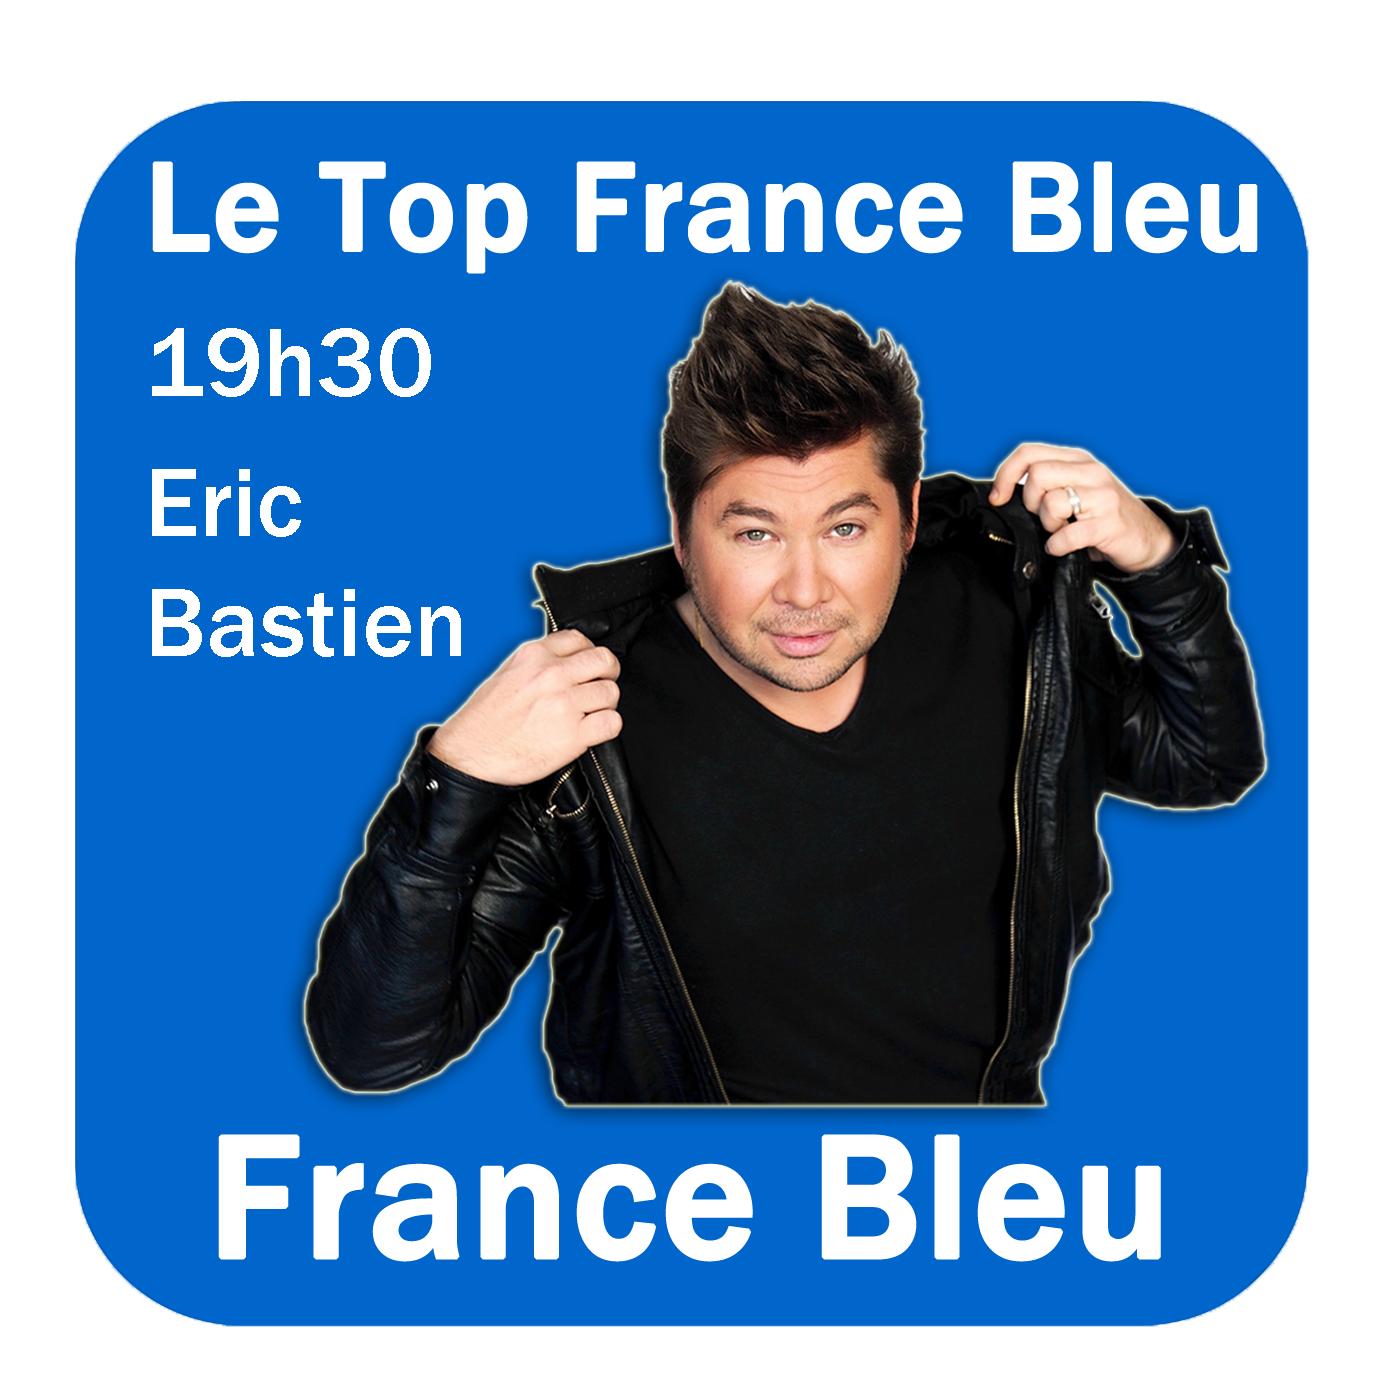 Le Top France Bleu